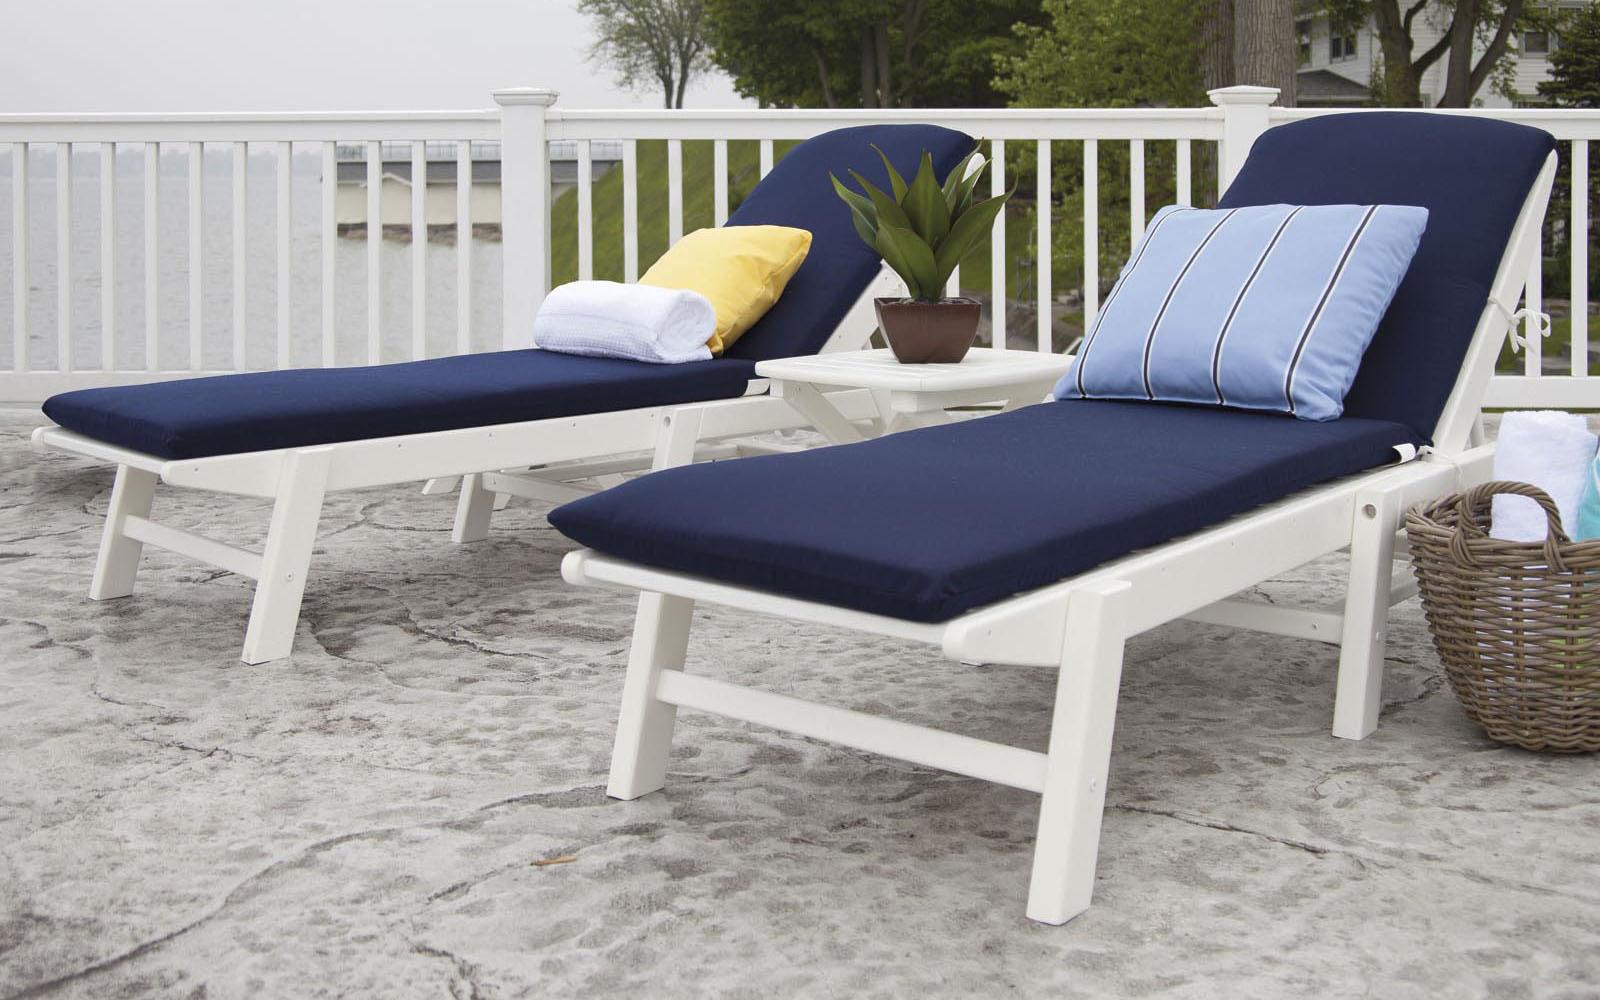 Polywood Chaise Lounge Set